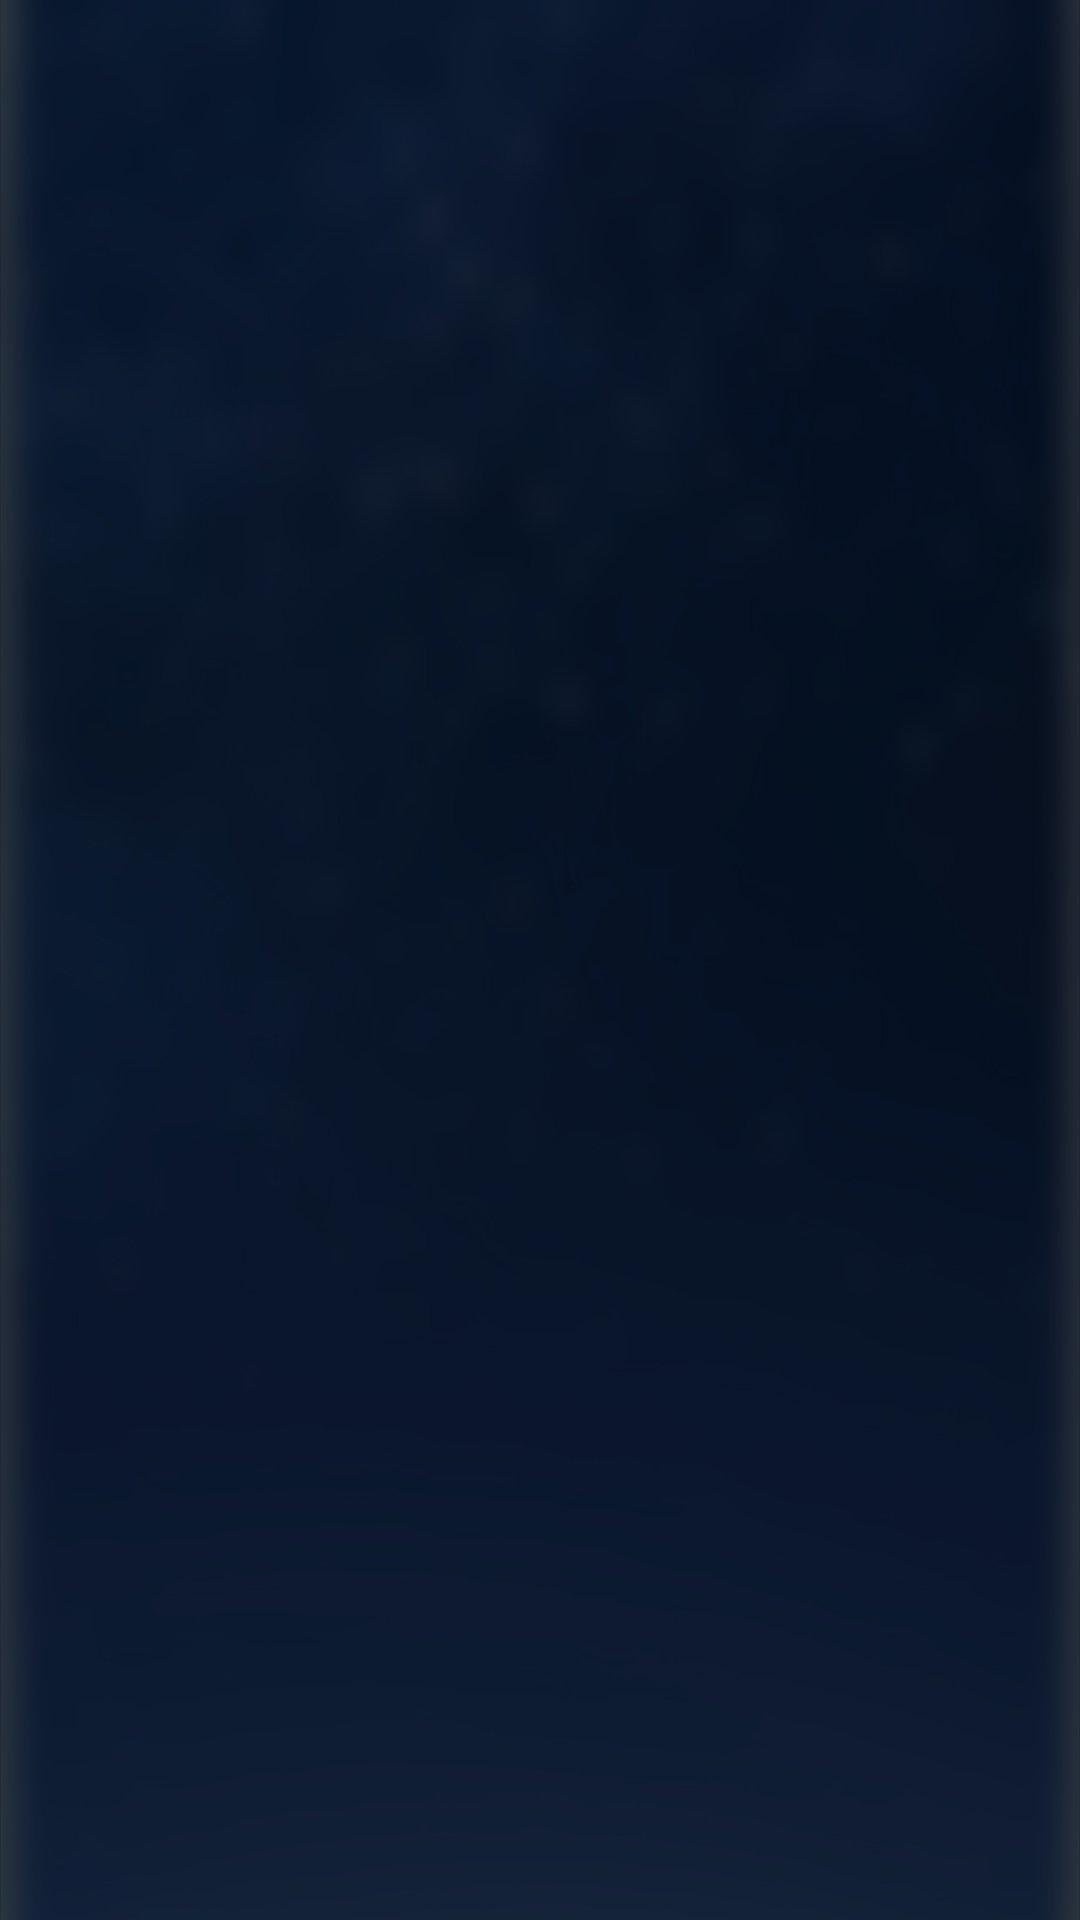 Immagini sfondo huawei p8 lite